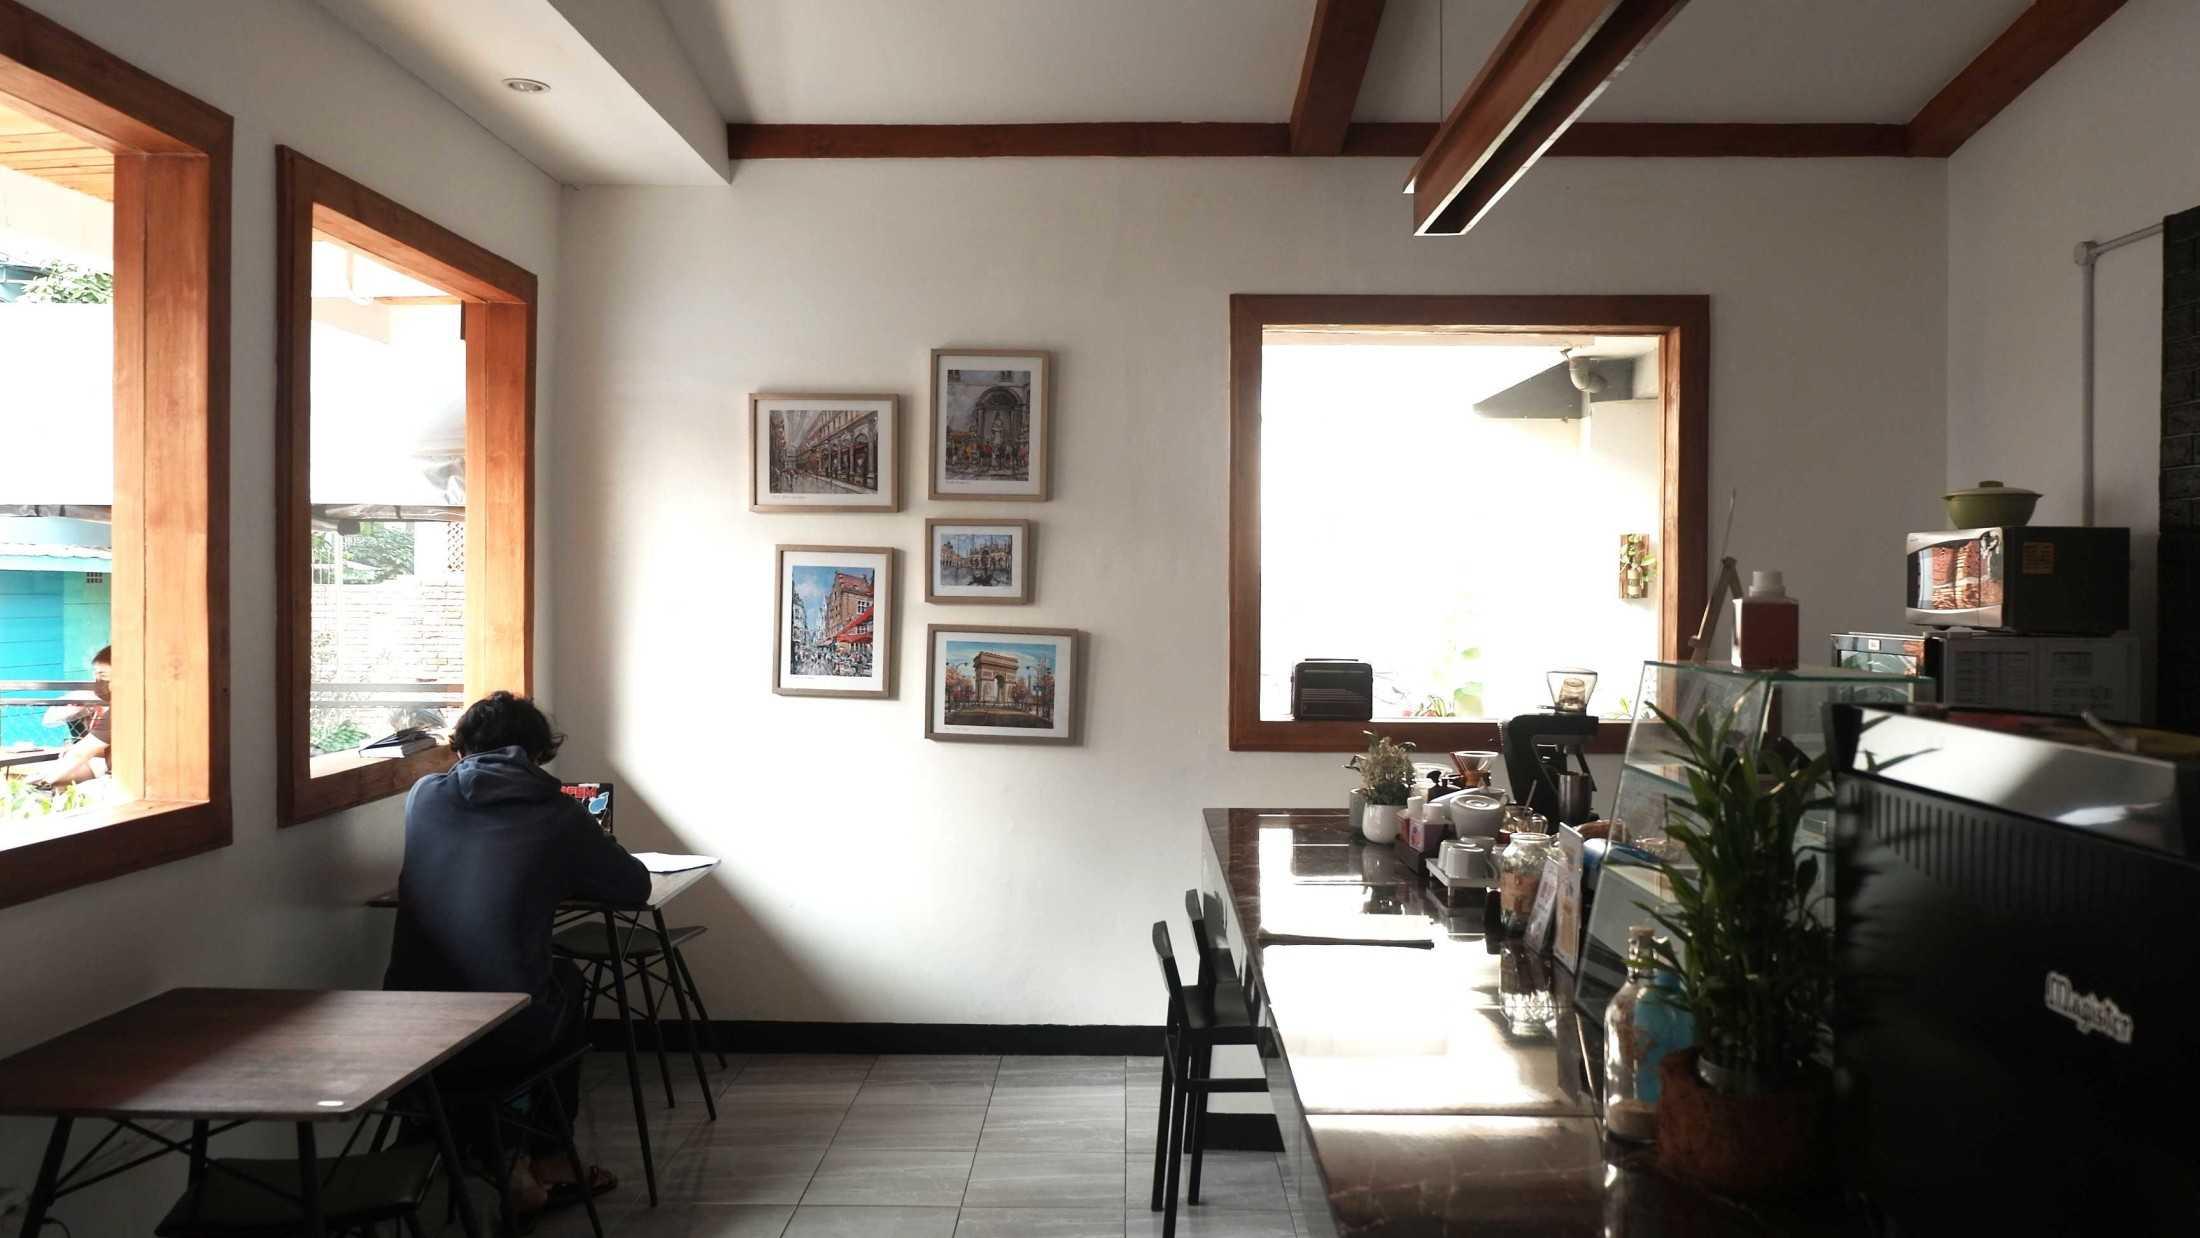 Mads+Partner Saturday Coffee 2.0 Jakarta Timur, Kota Jakarta Timur, Daerah Khusus Ibukota Jakarta, Indonesia Jakarta Timur, Kota Jakarta Timur, Daerah Khusus Ibukota Jakarta, Indonesia Madspartners-Saturday-Coffee-20  124558